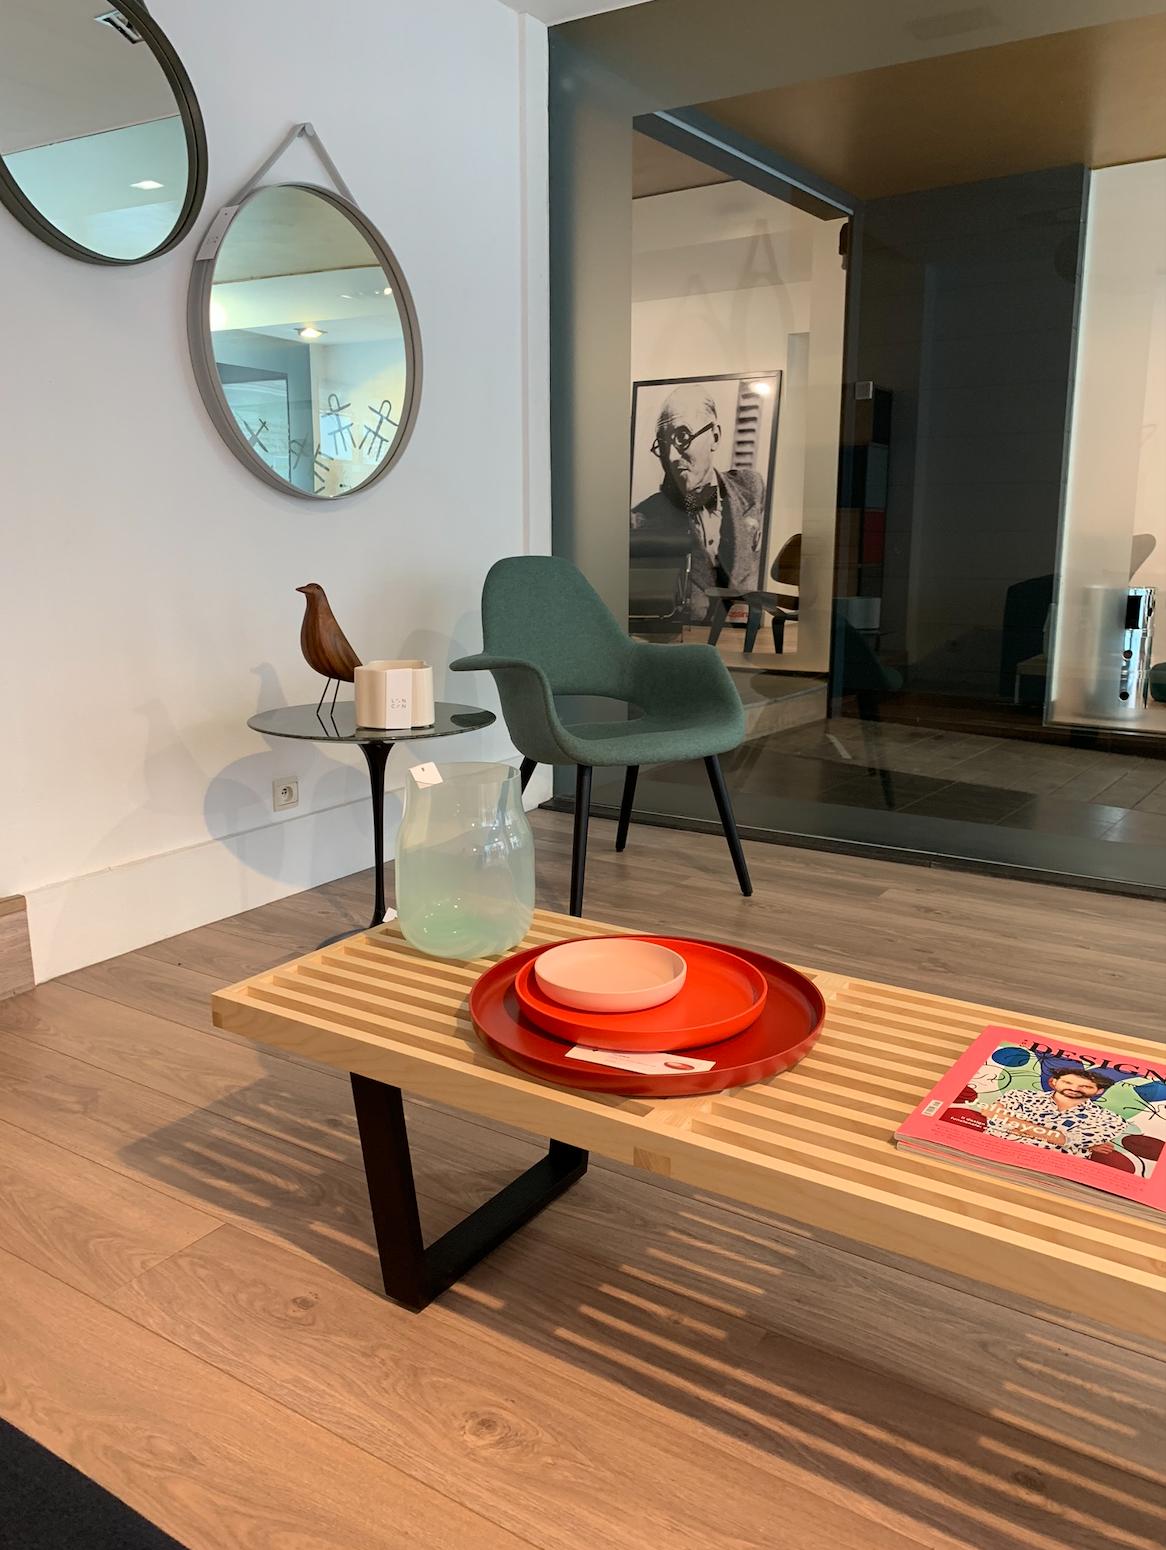 Organic Chair  Lounge Vitra Hasselt Loncin interieur en design meubelwinkel vitra verdeler dealer Eames Saarinen .png